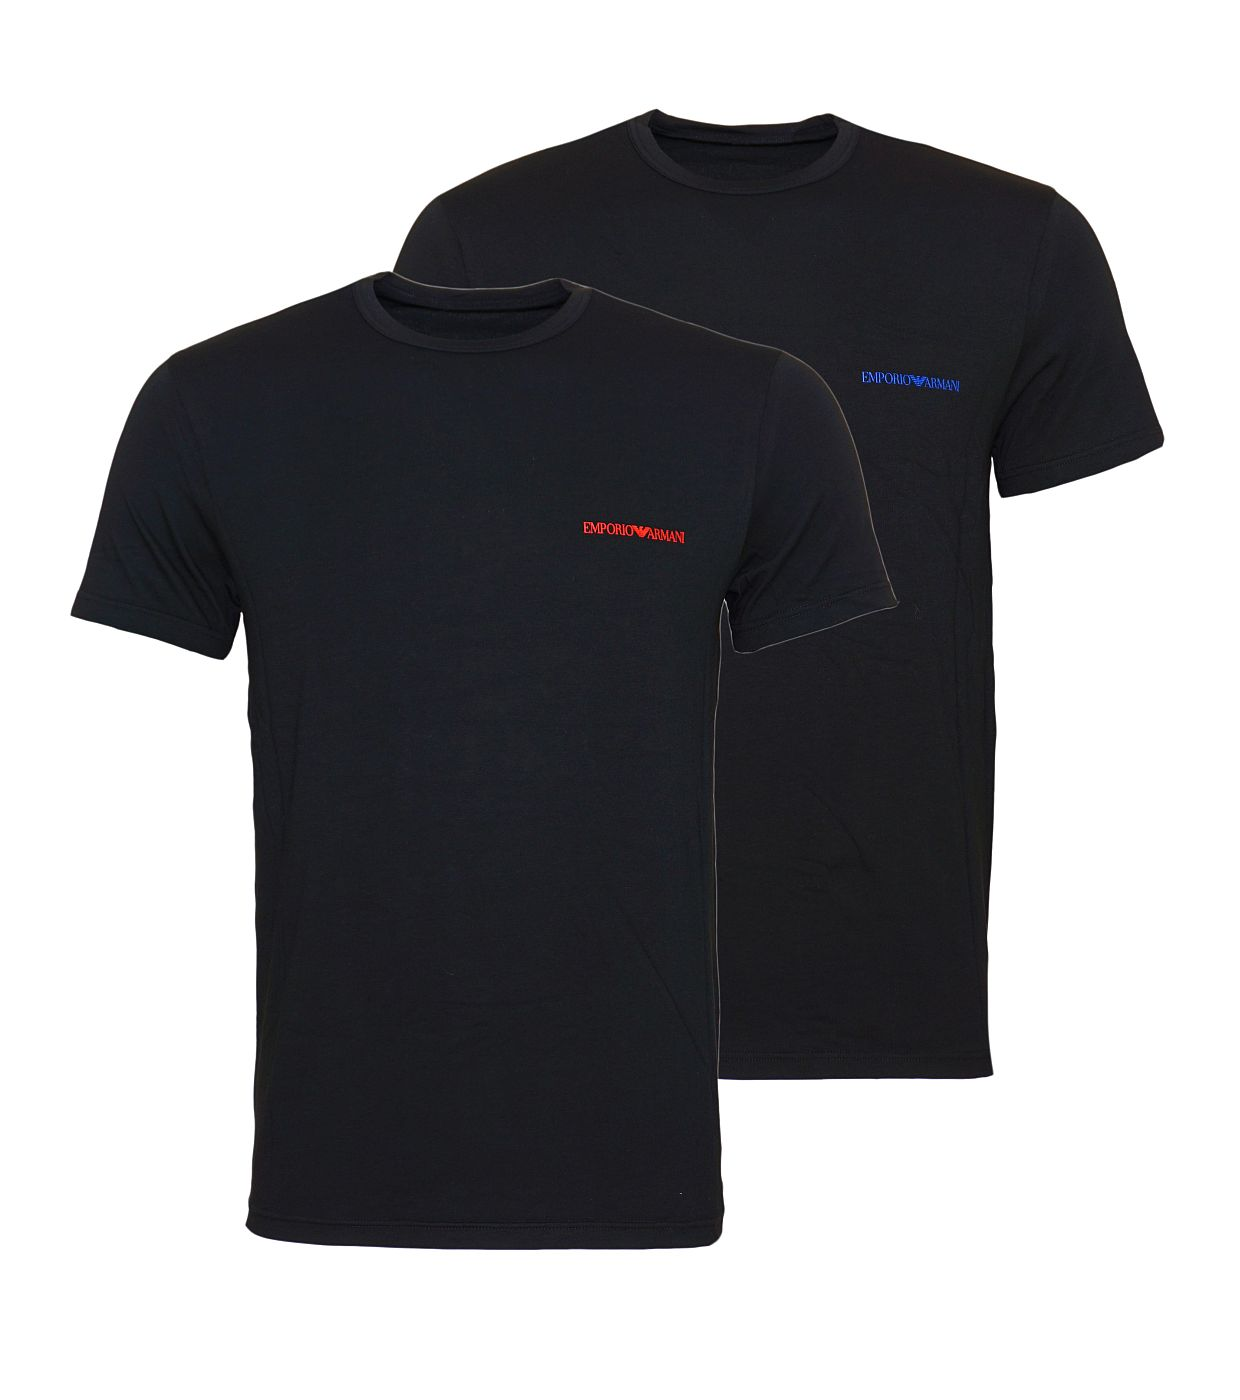 Emporio Armani 2er Pack T-Shirts Rundhals 111267 8A717 17020 NERO/NERO SH18-EAT1